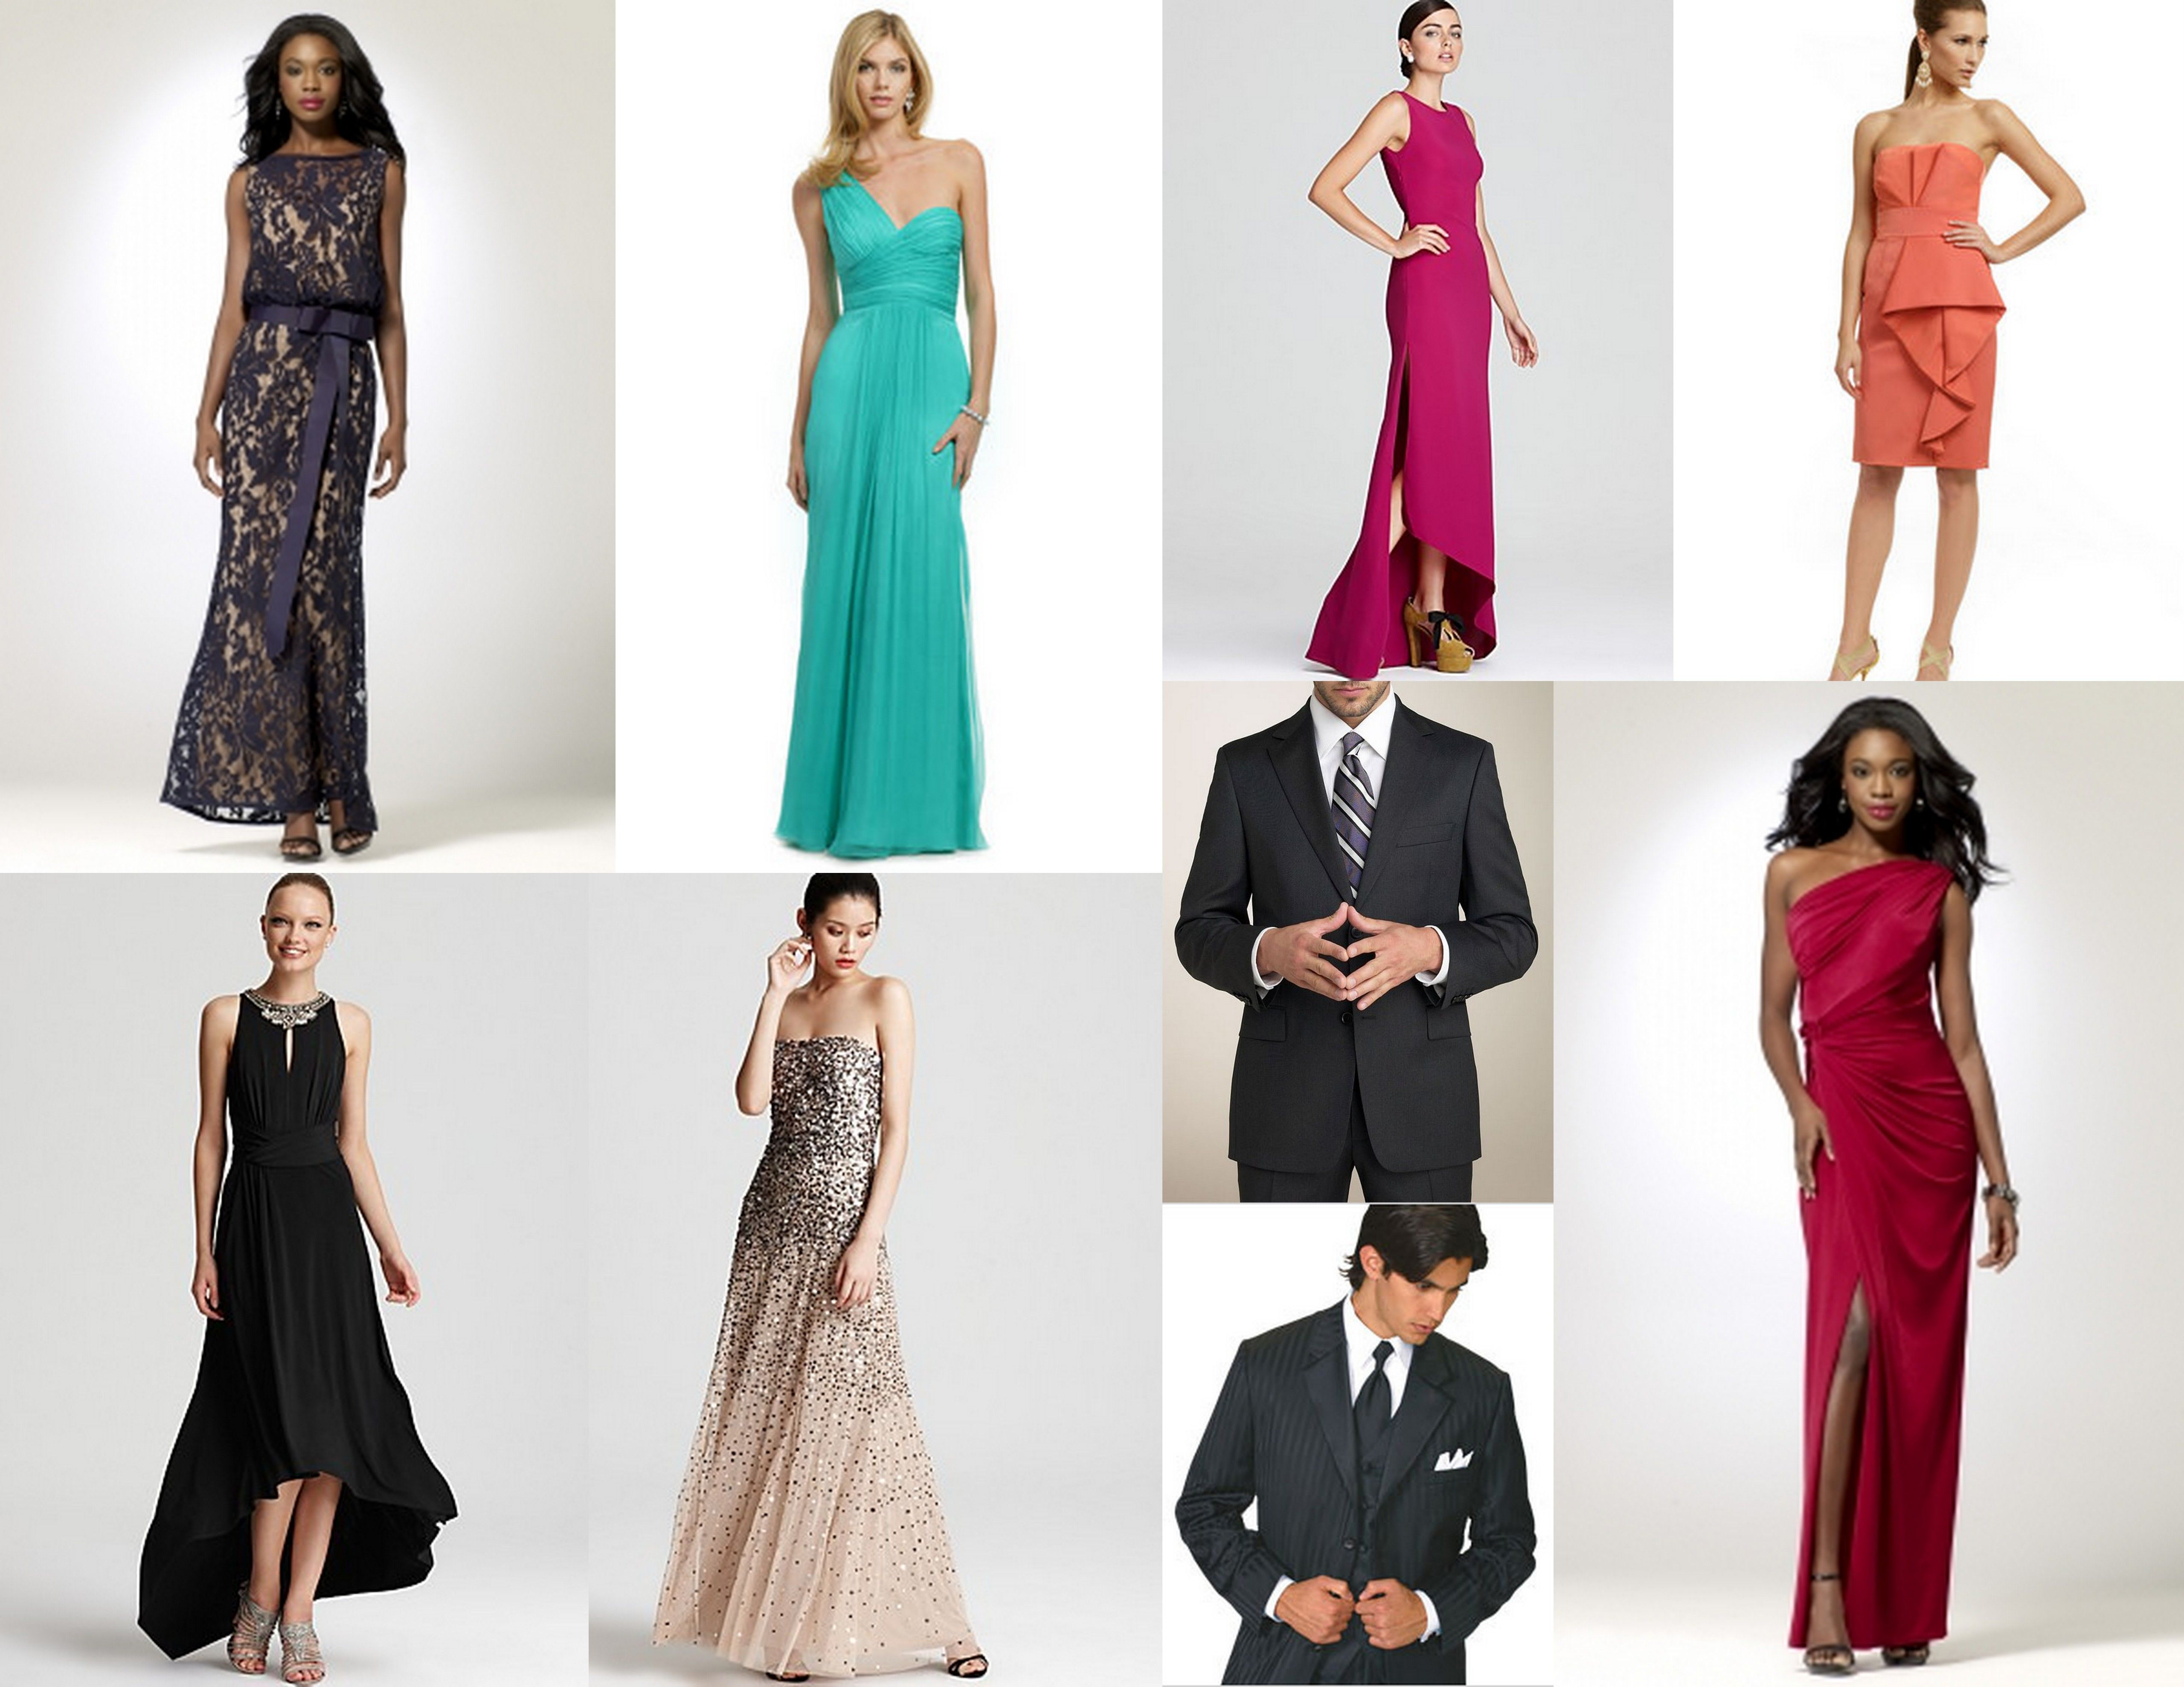 Popular Black Tie Optional Dress Code Guide Dress Code Guide Dress Codes Black Black Tie Optional Dress Casual Summer Wedding Attire Black Tie Dress Wedding